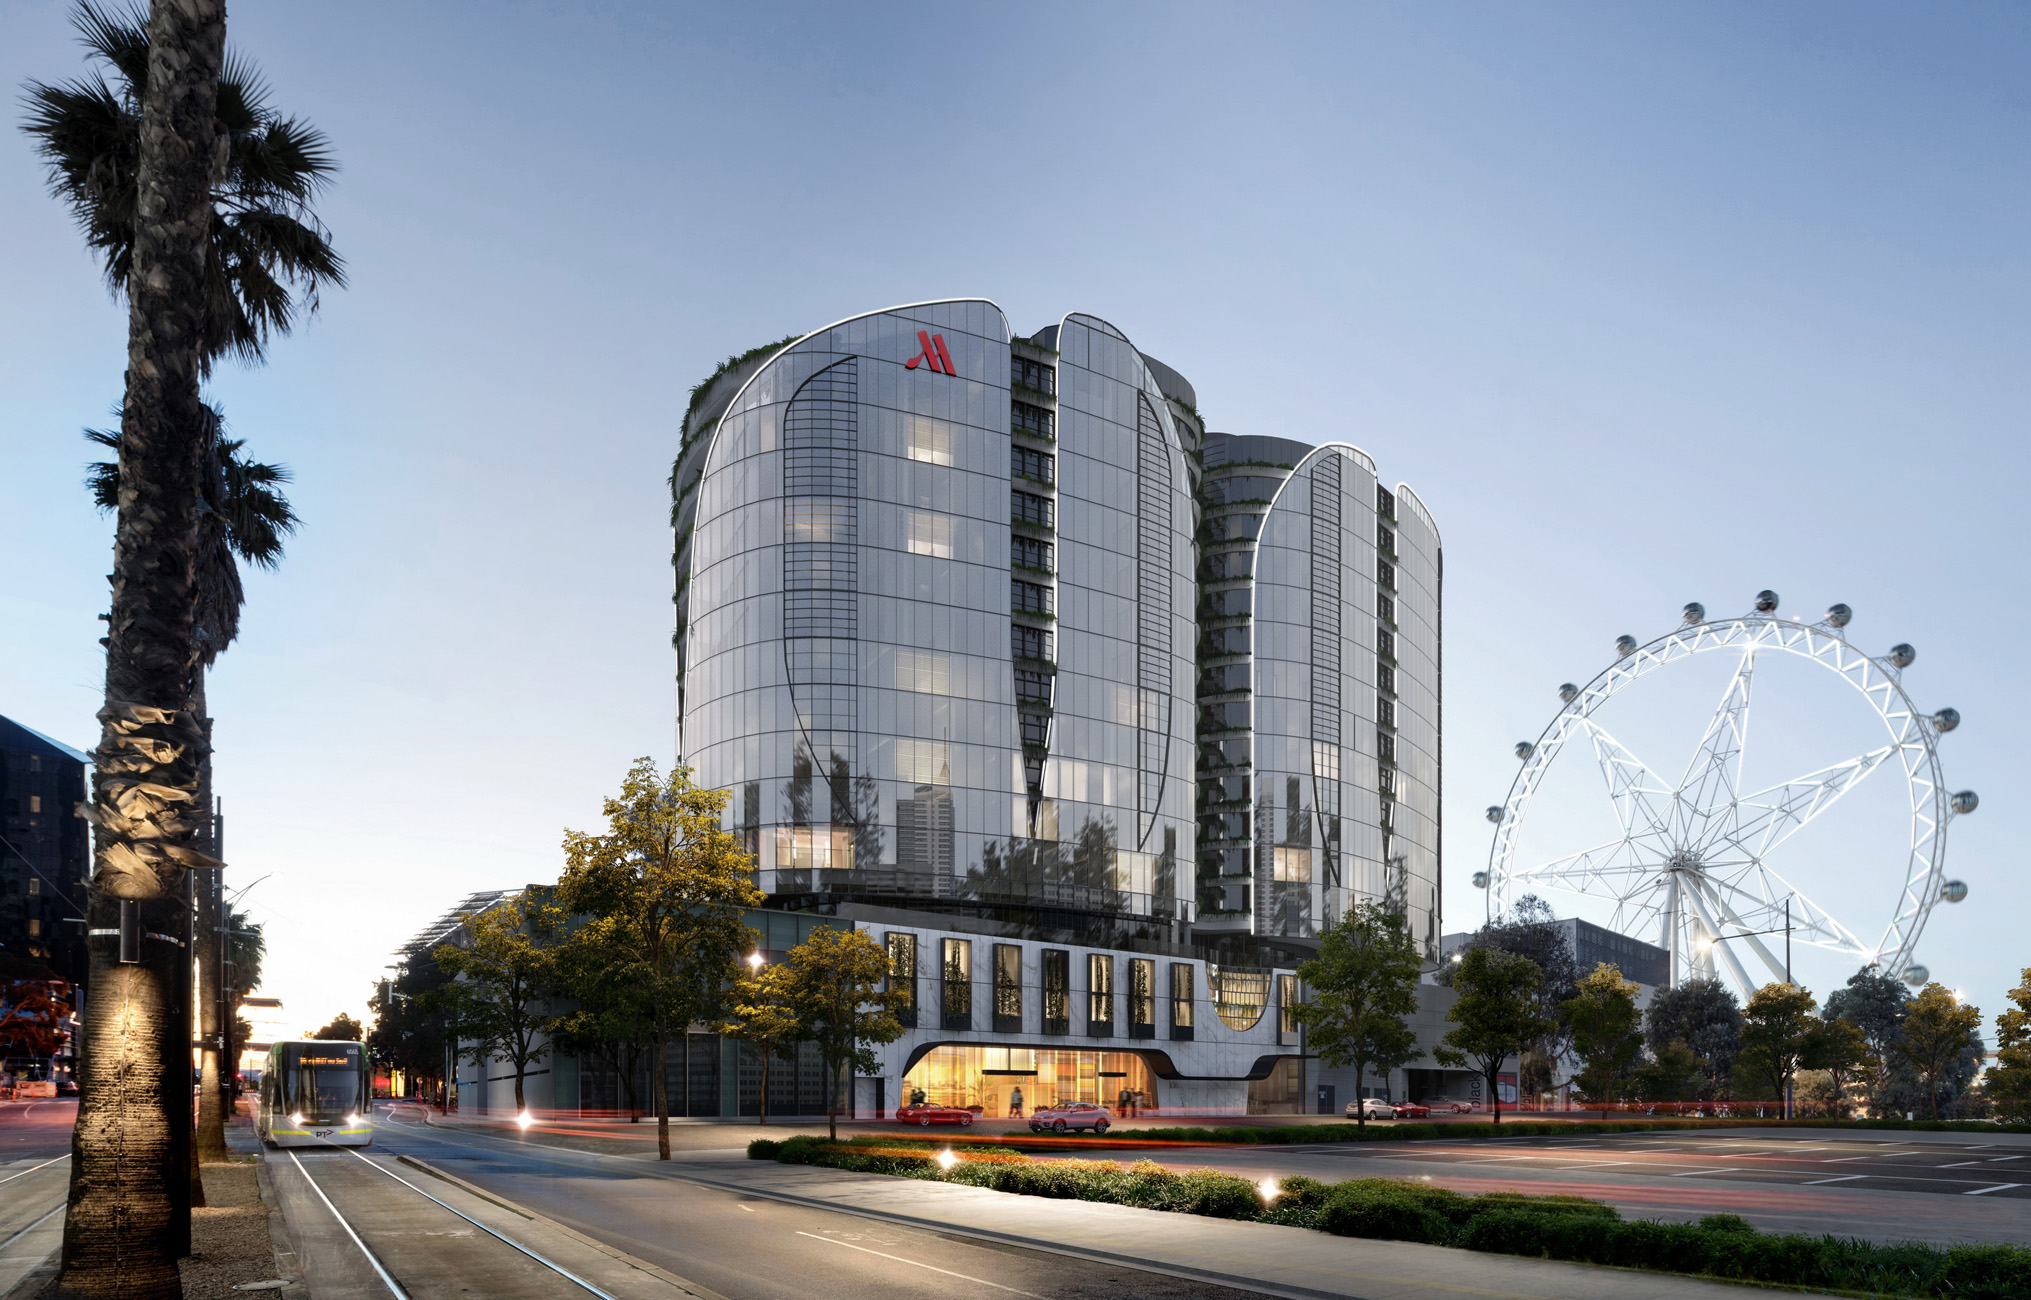 The-Docklands-property-development-3d-architectural-images-FKD-Studio-scene